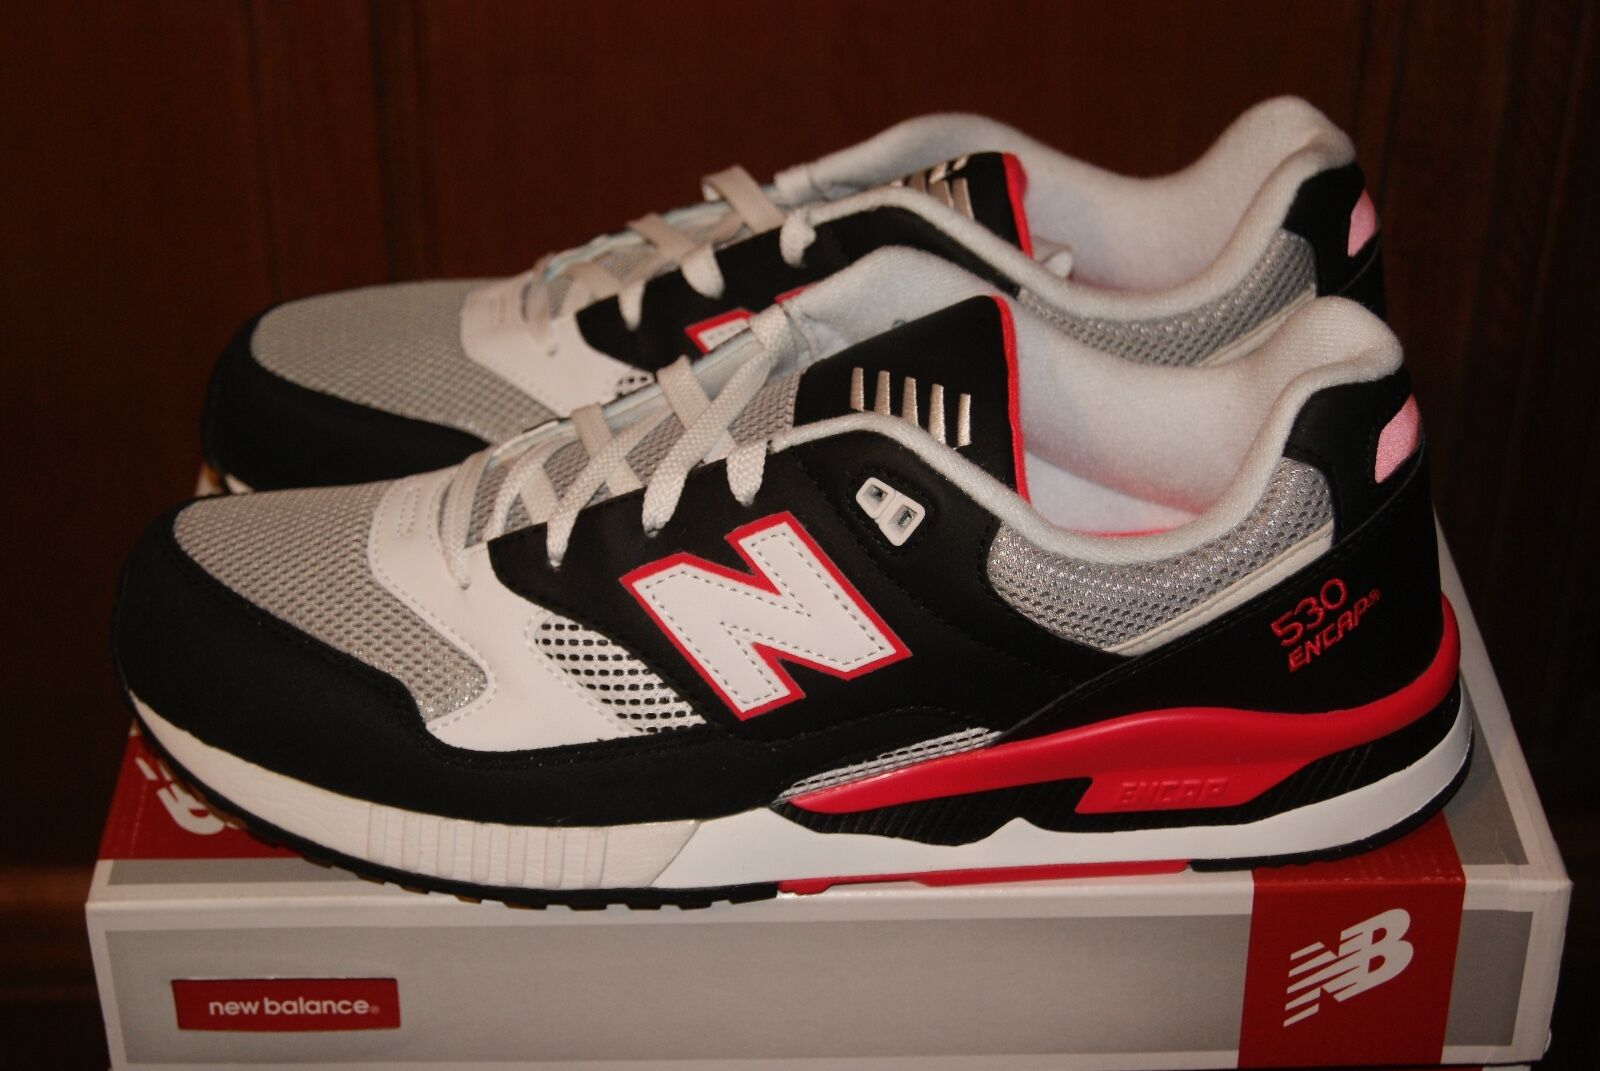 hommes New Balance M530BGM rose gris blanc 10 or 10.5 Run Walk Chaussures